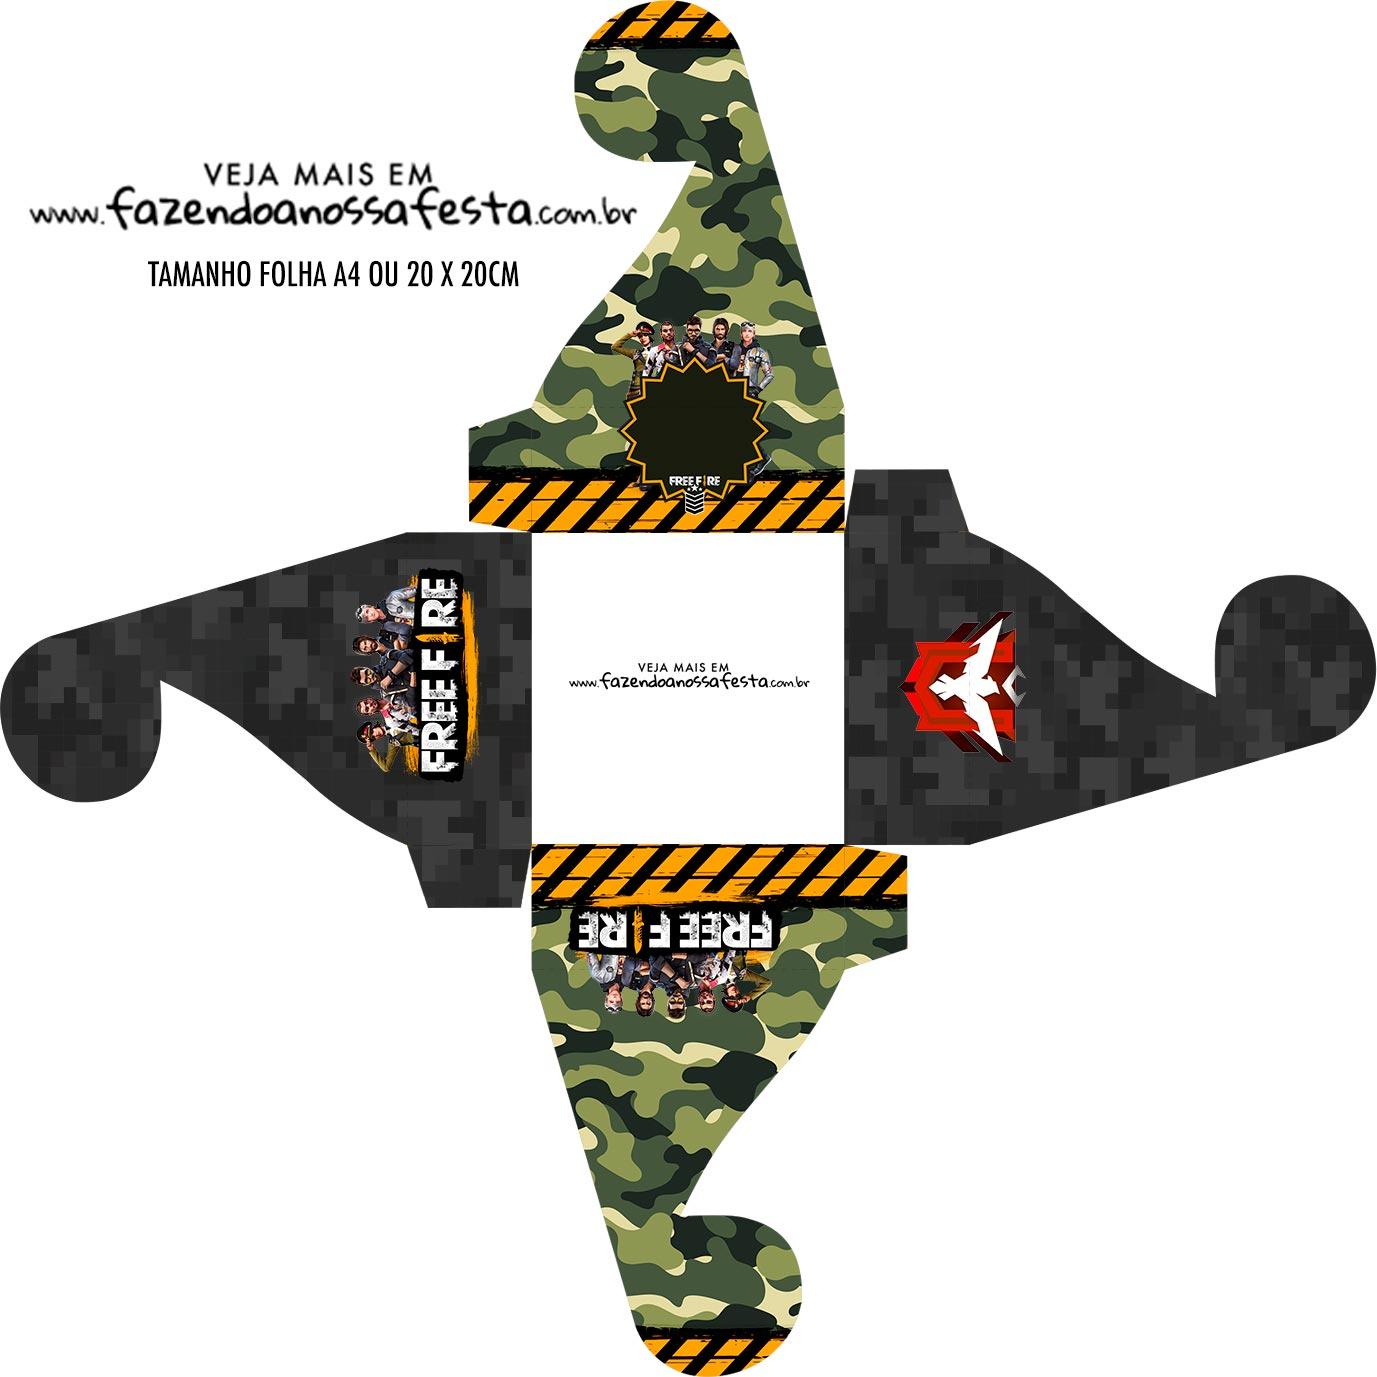 Caixa bombom personalizada Free Fire